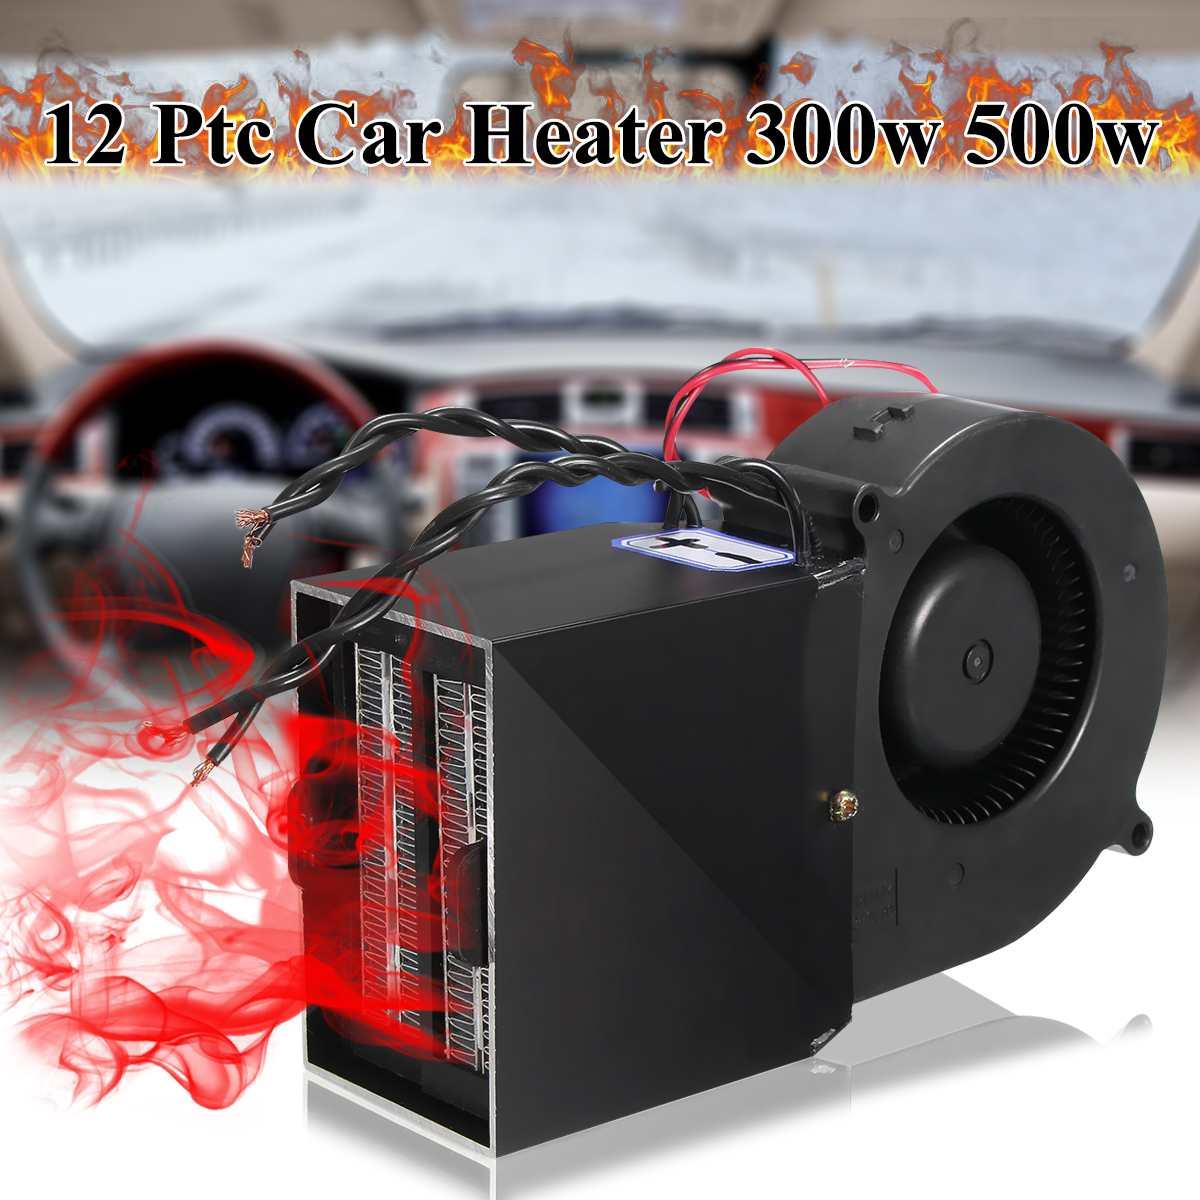 DC 12V Adjustable 350W 500W Ceramic Car Heating Heater Hot Fan Defroster Demister Car Electrical Heating Fans Instant Heating